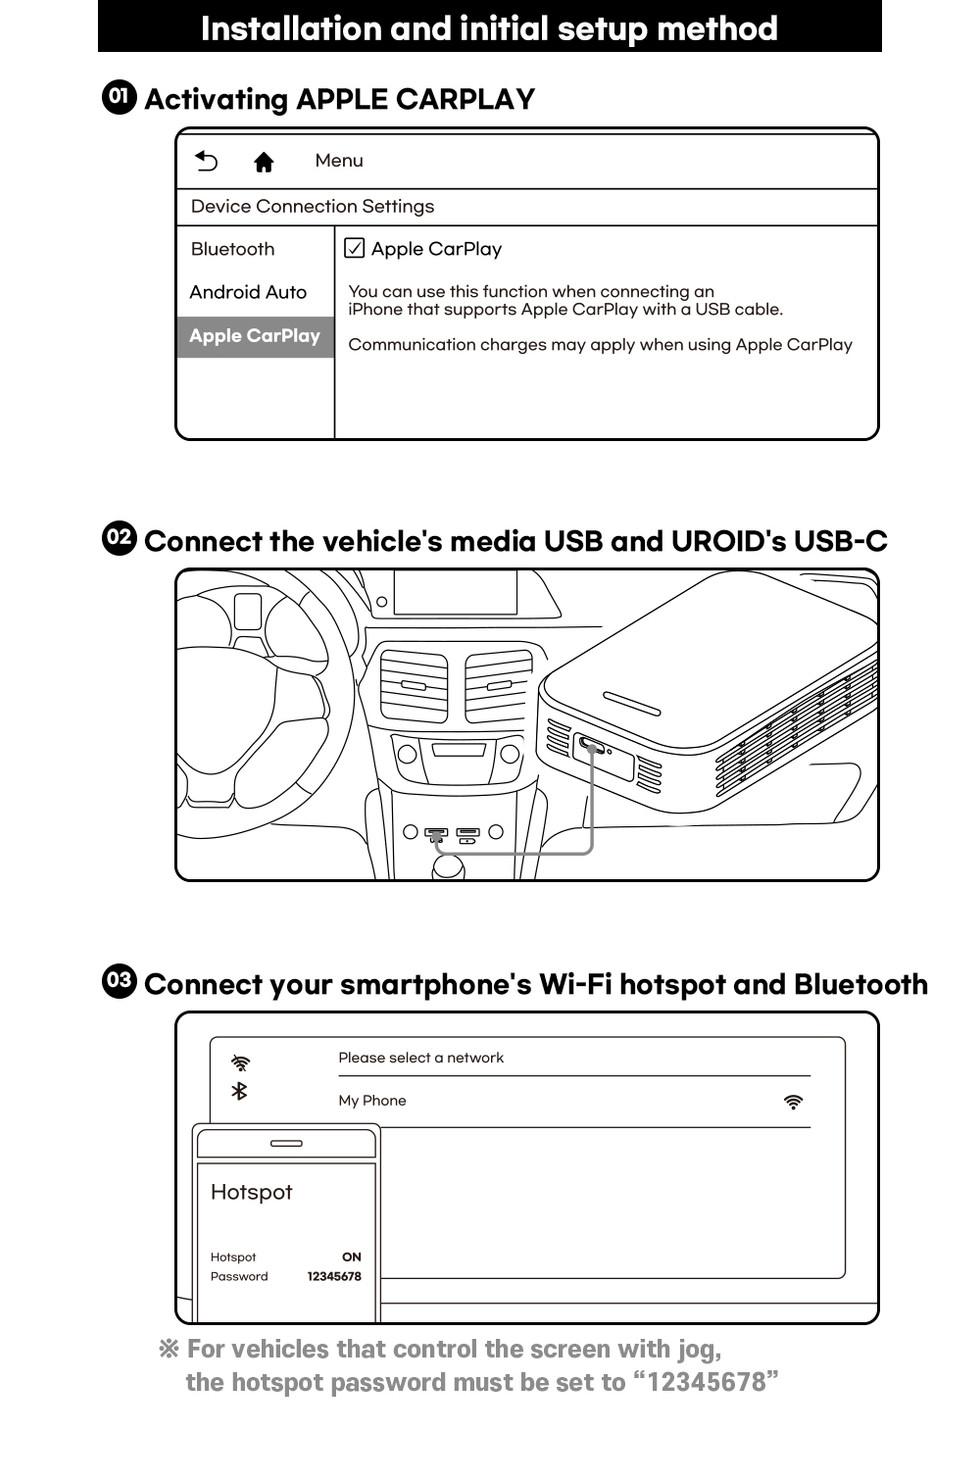 11_USB_Connected.jpg